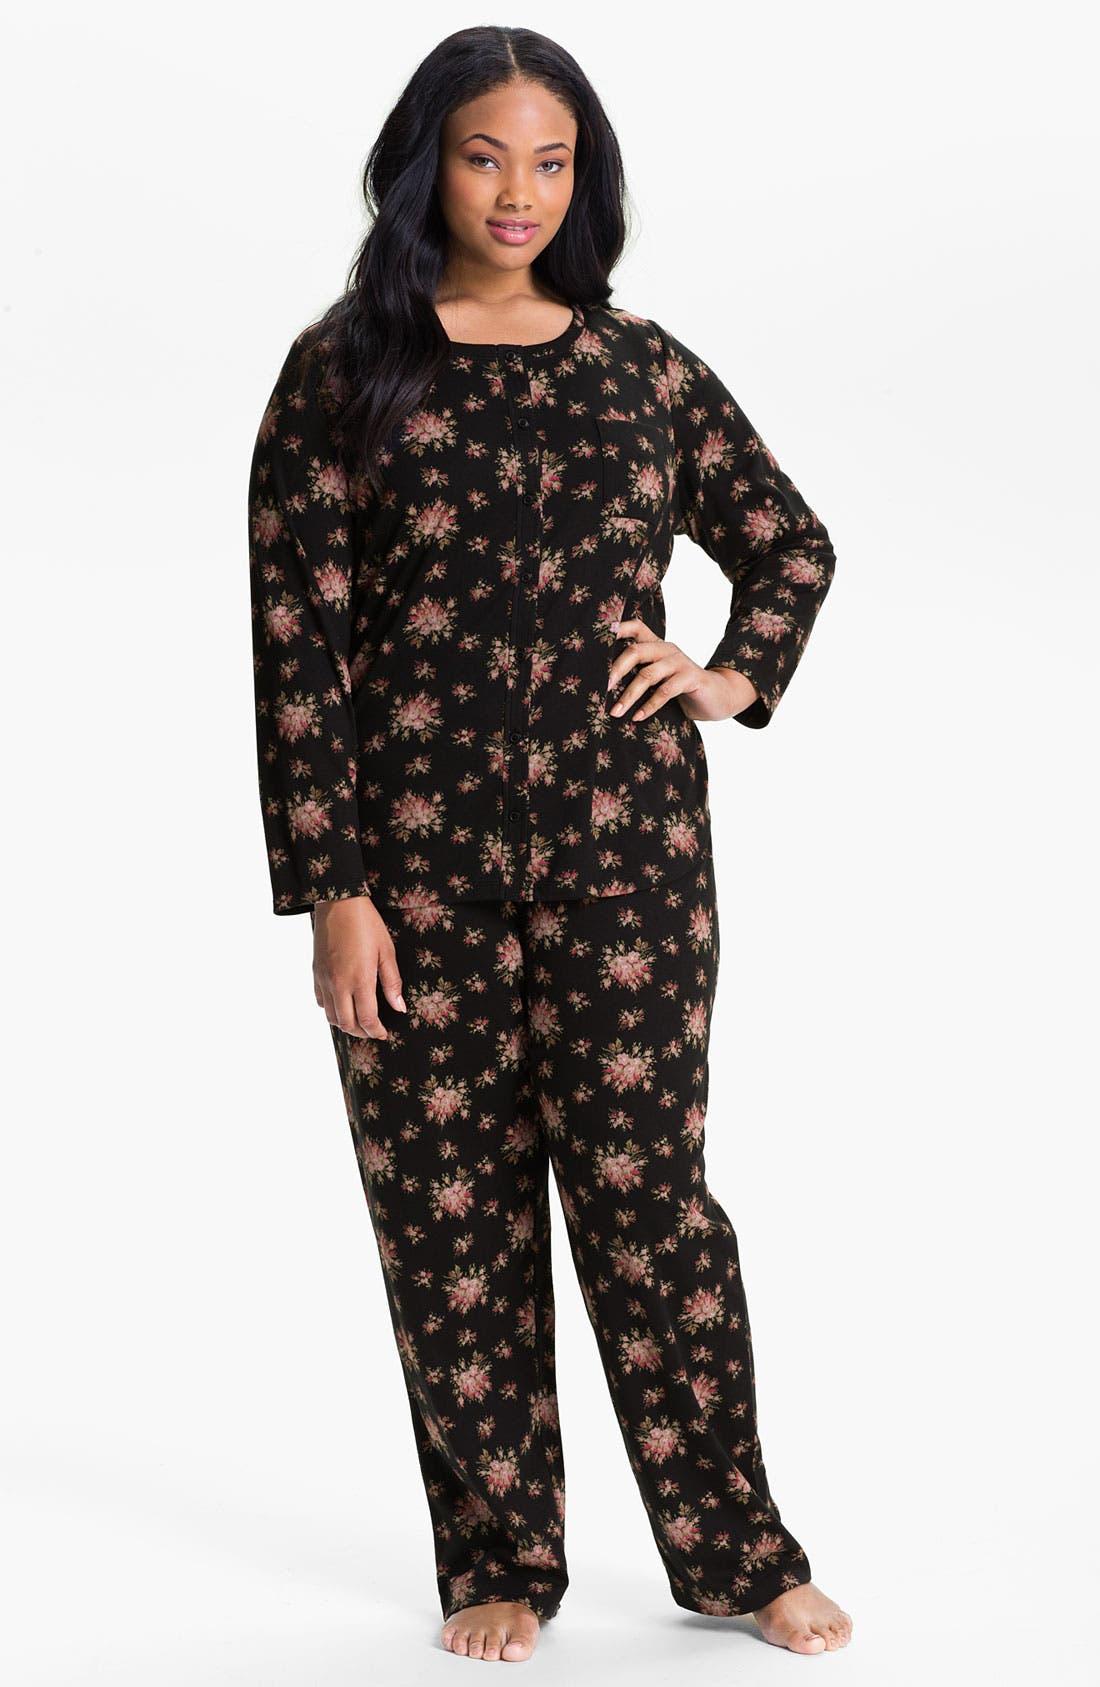 Alternate Image 1 Selected - Carole Hochman Designs Interlock Knit Pajamas (Plus)